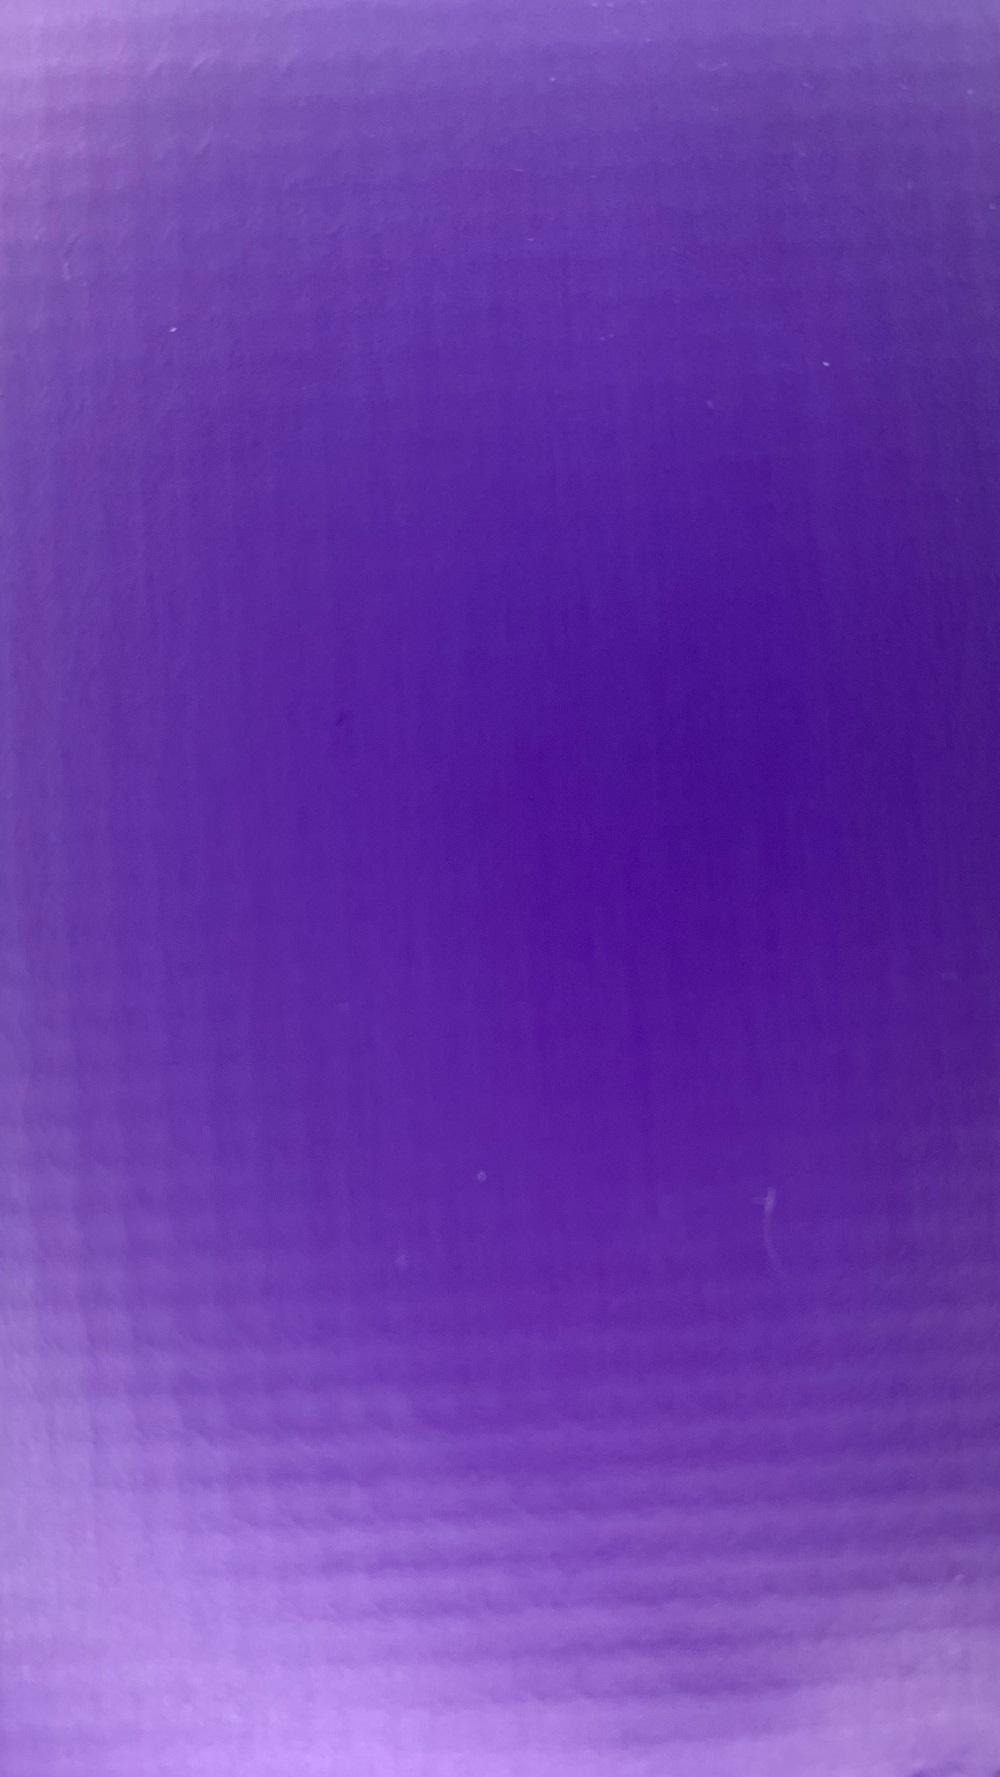 Lona Vinilona Df Fosca Violeta S-022 1,45mt X 50,0mts